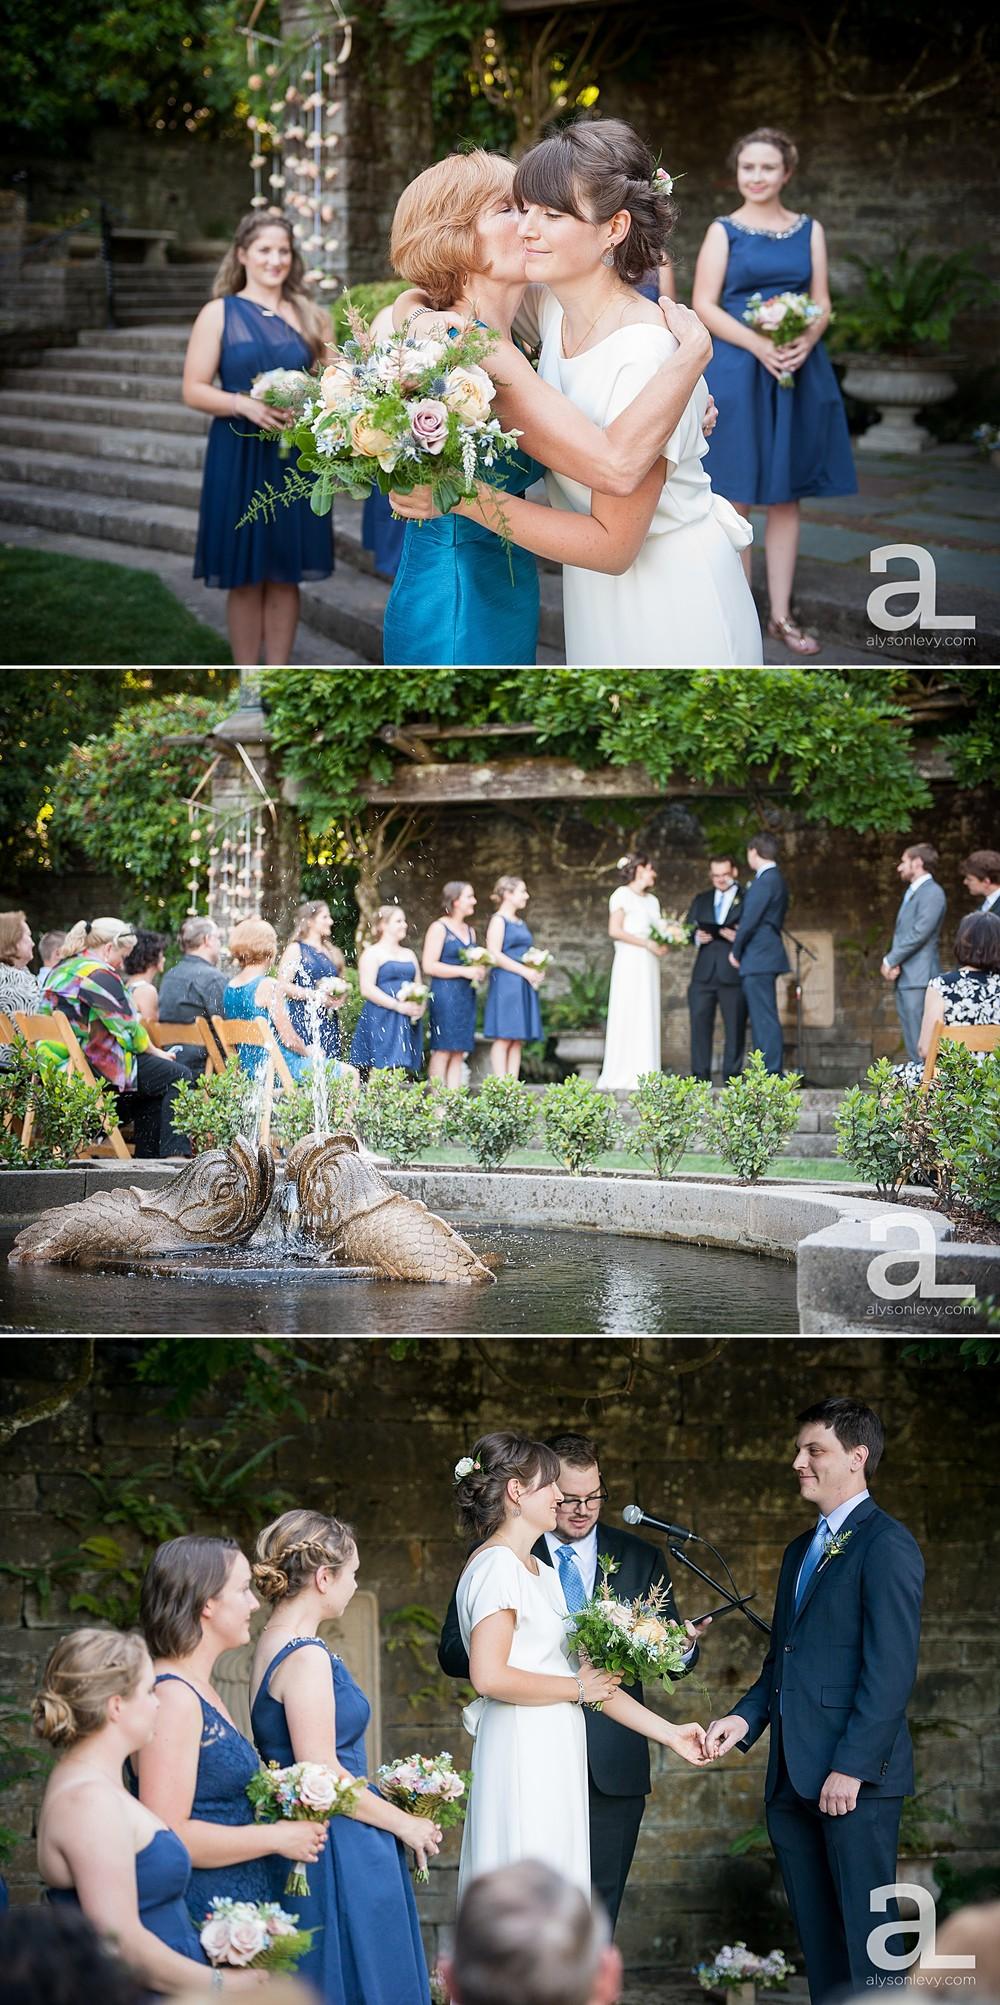 Lewis-Clark-Estate-Gardens-Portland-Wedding-Photography_0011.jpg